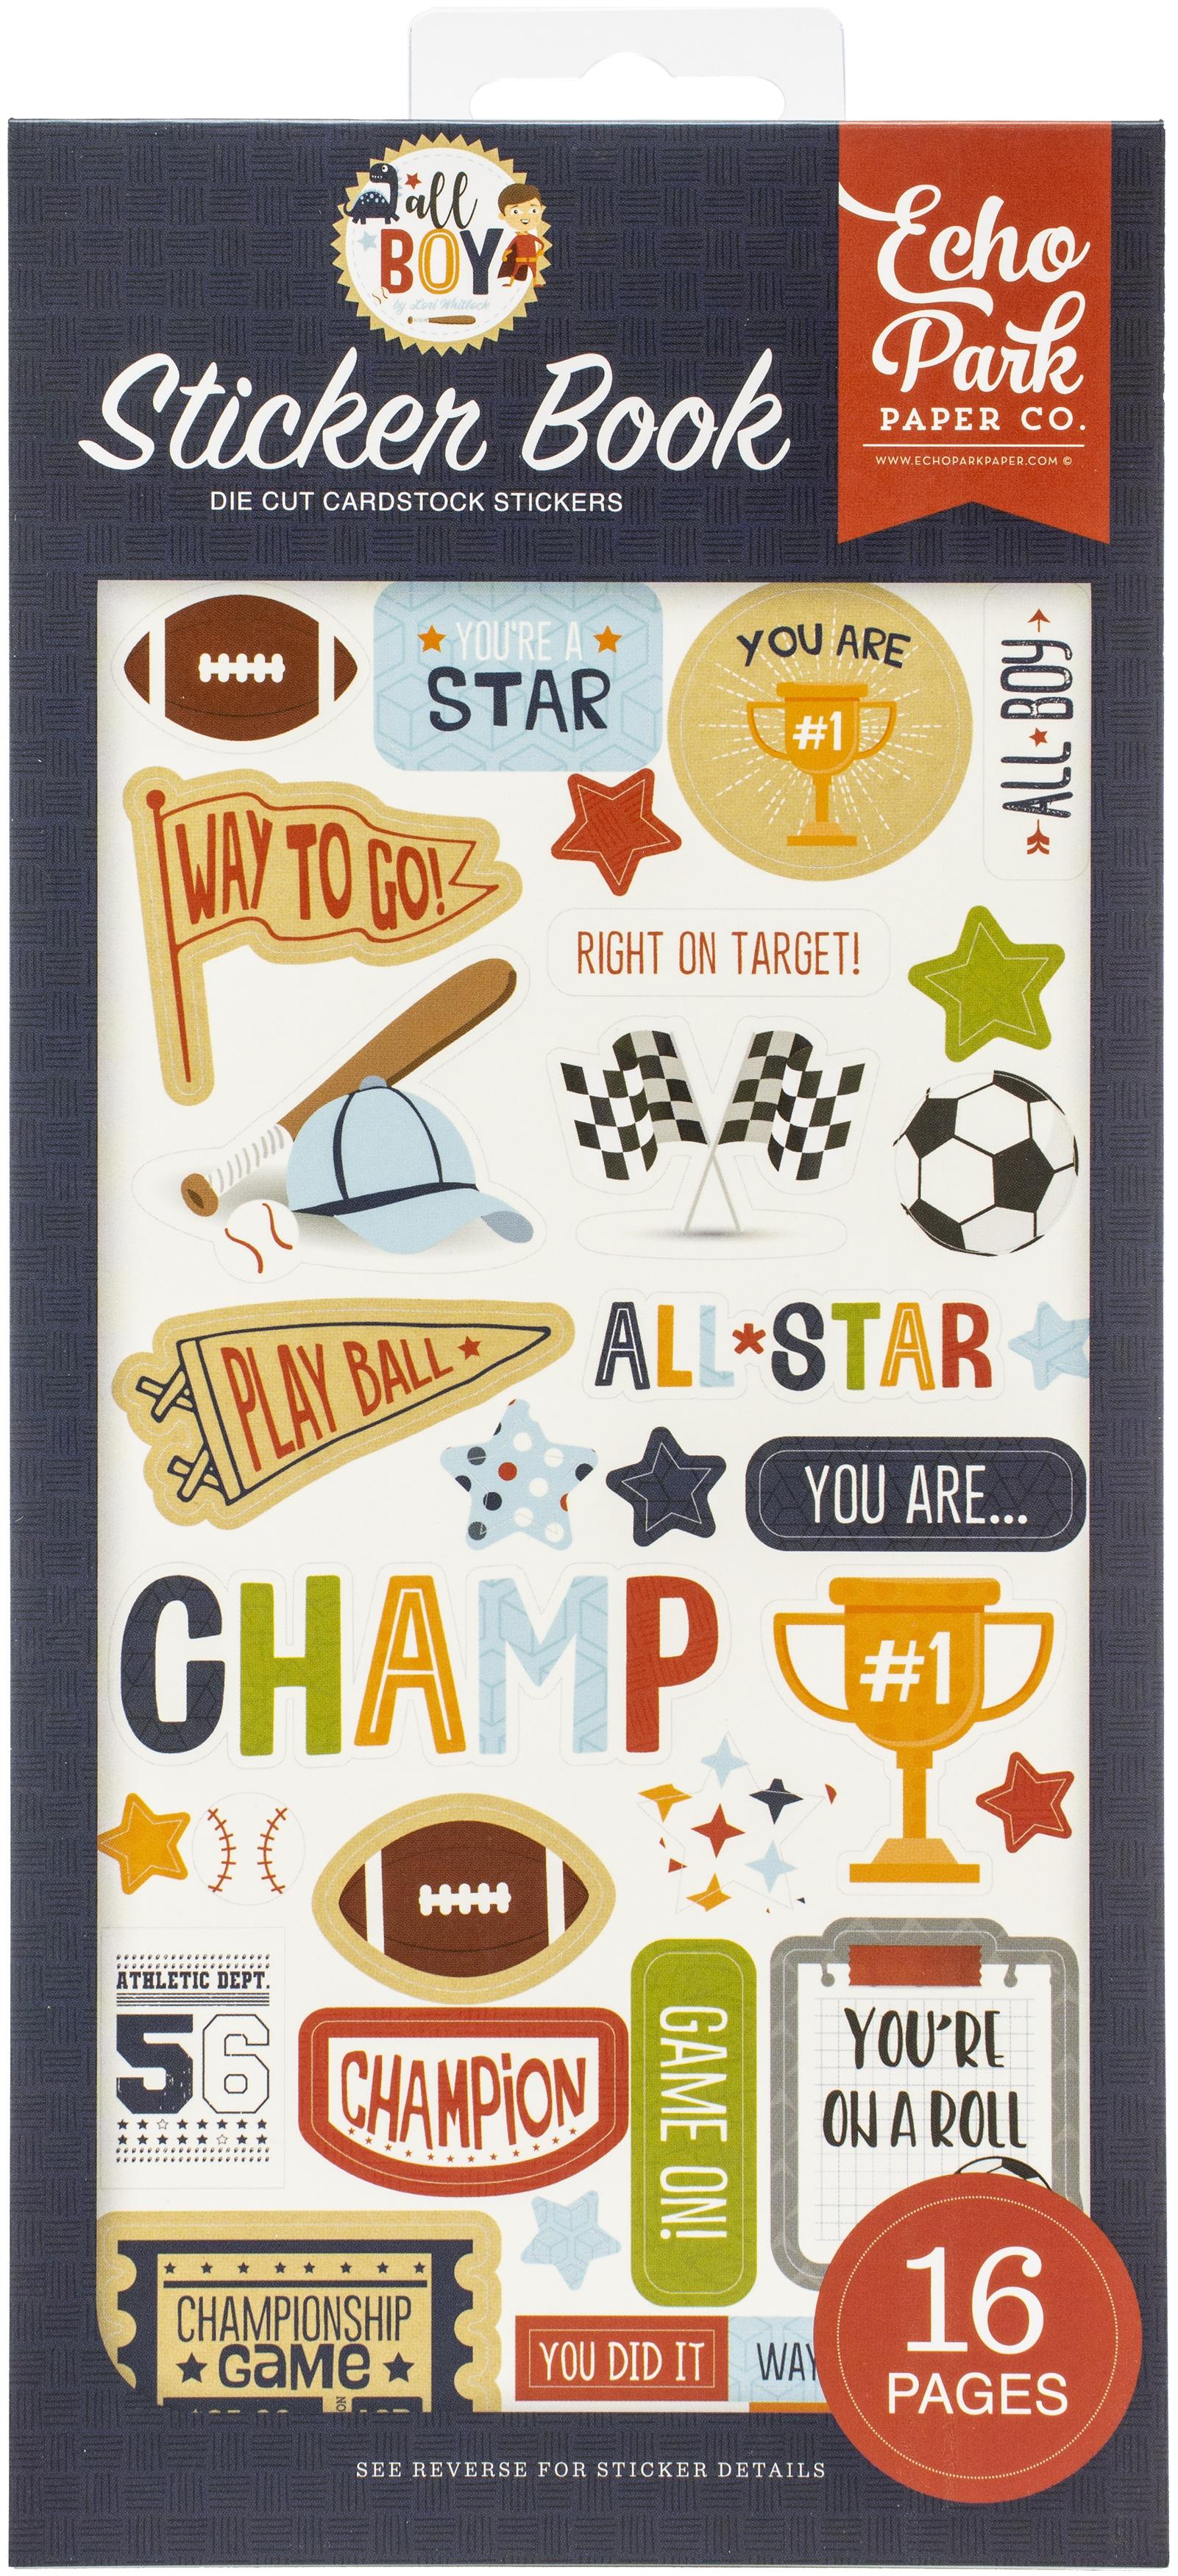 All Boy Sticker Book